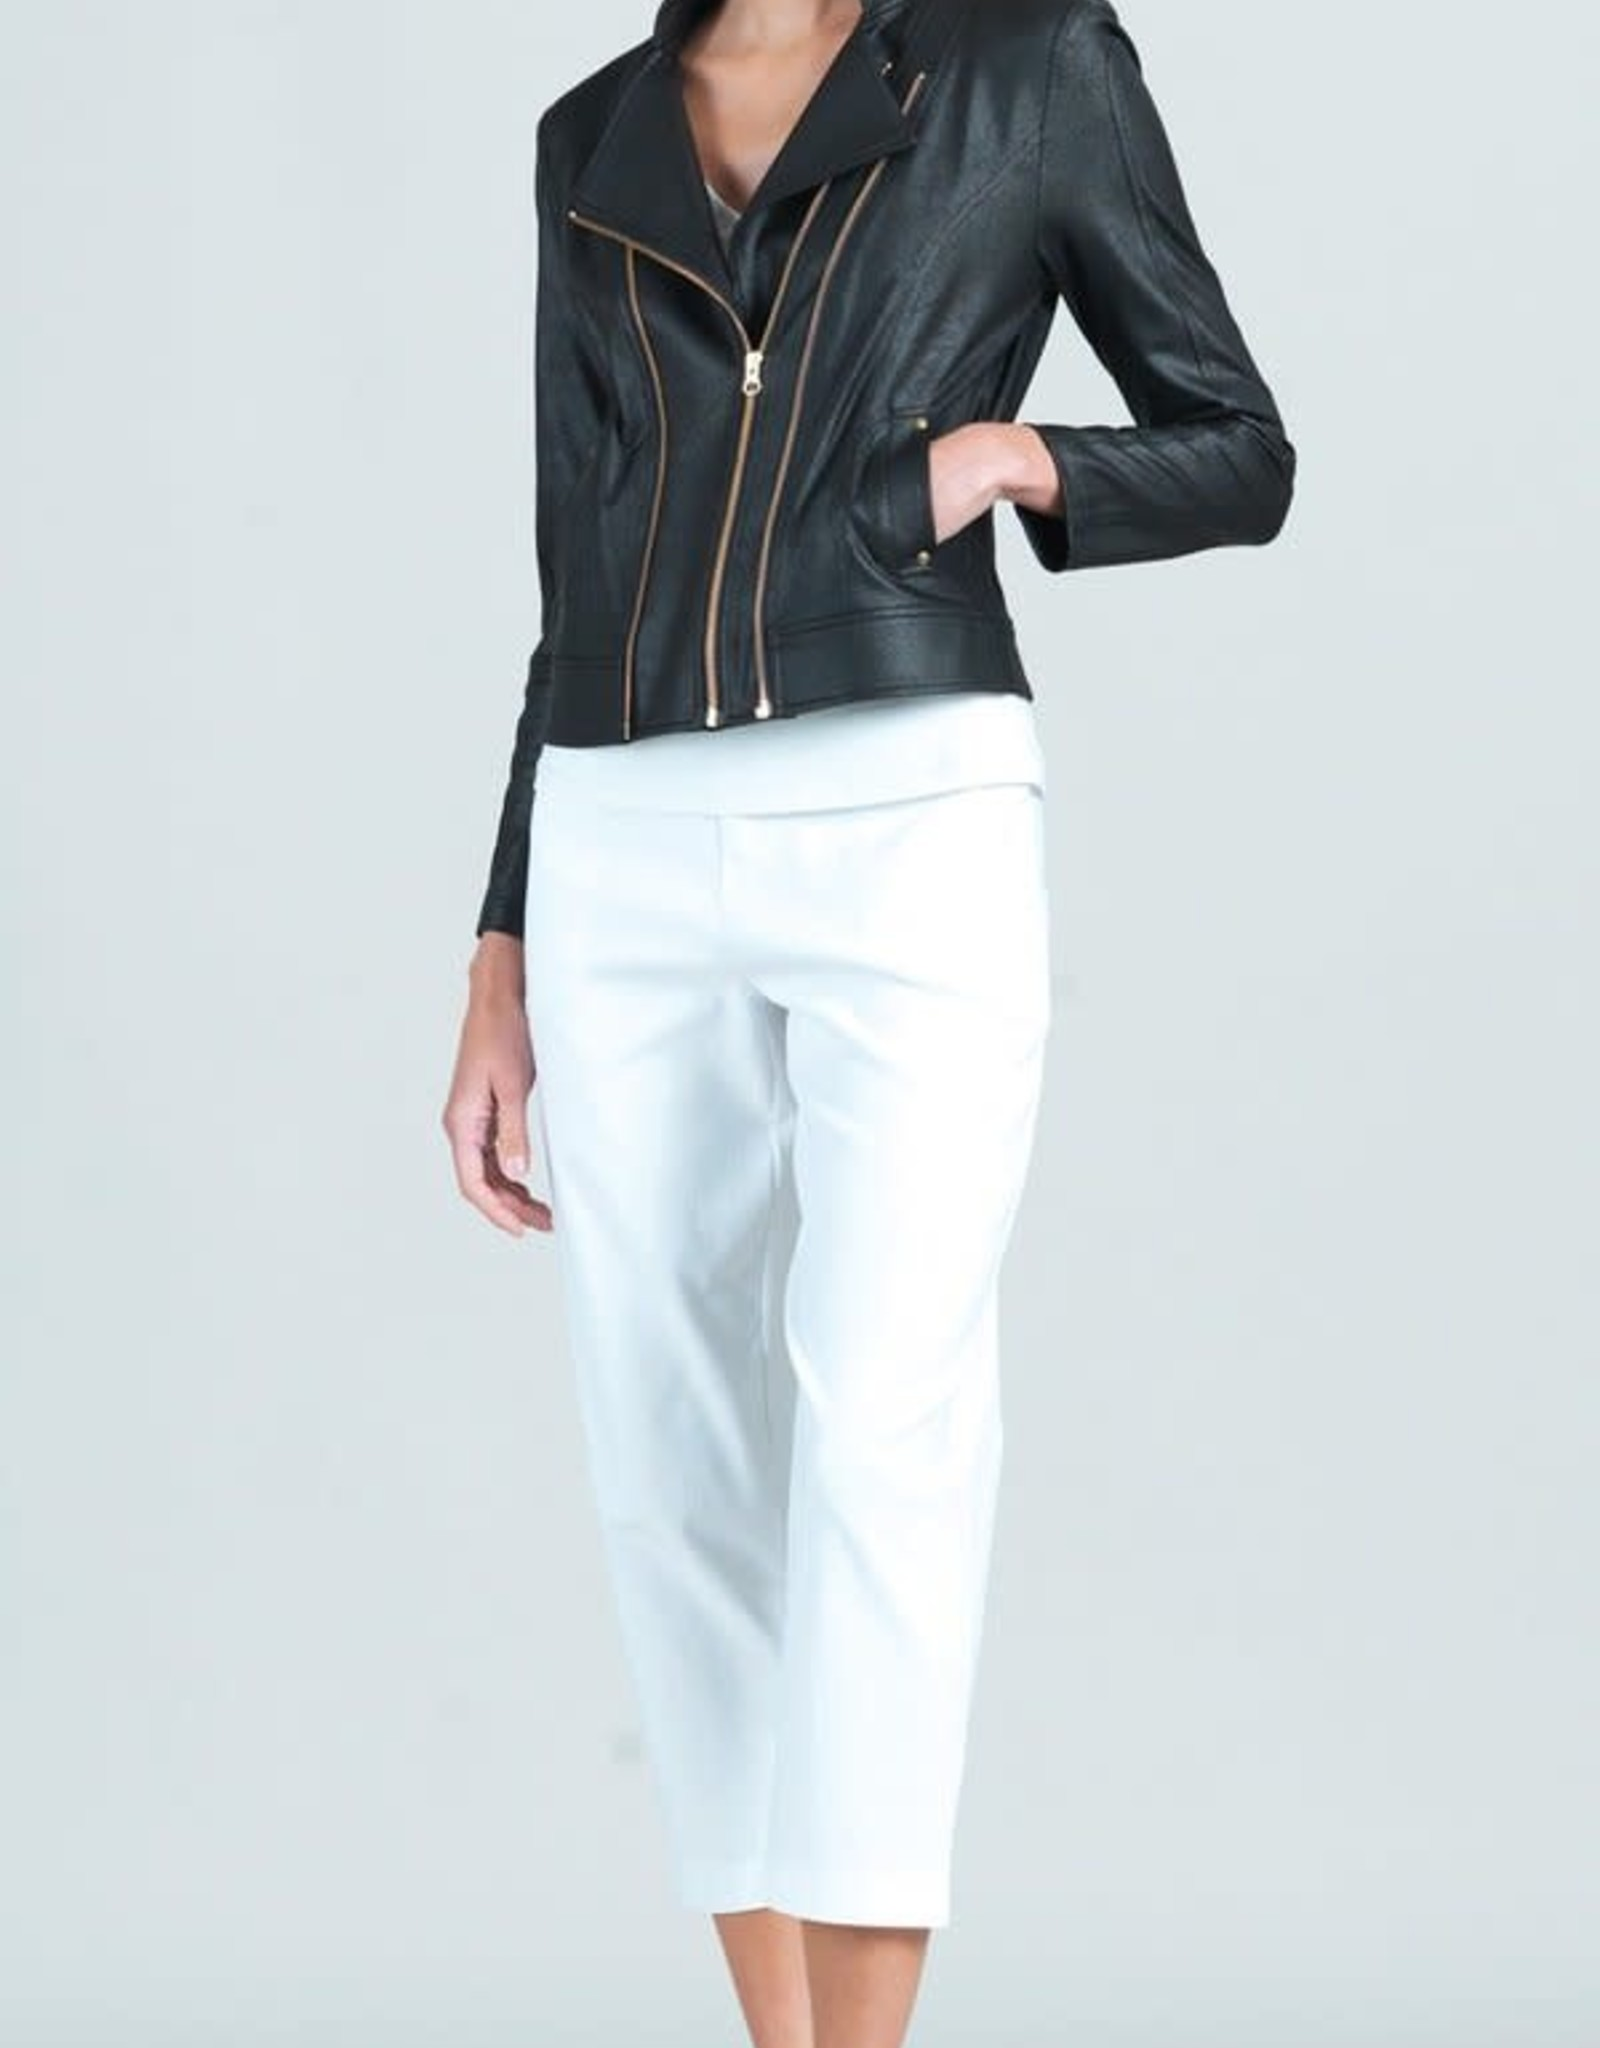 Clara Sunwoo Black Liquid Leather Double Zip w/ Pocket